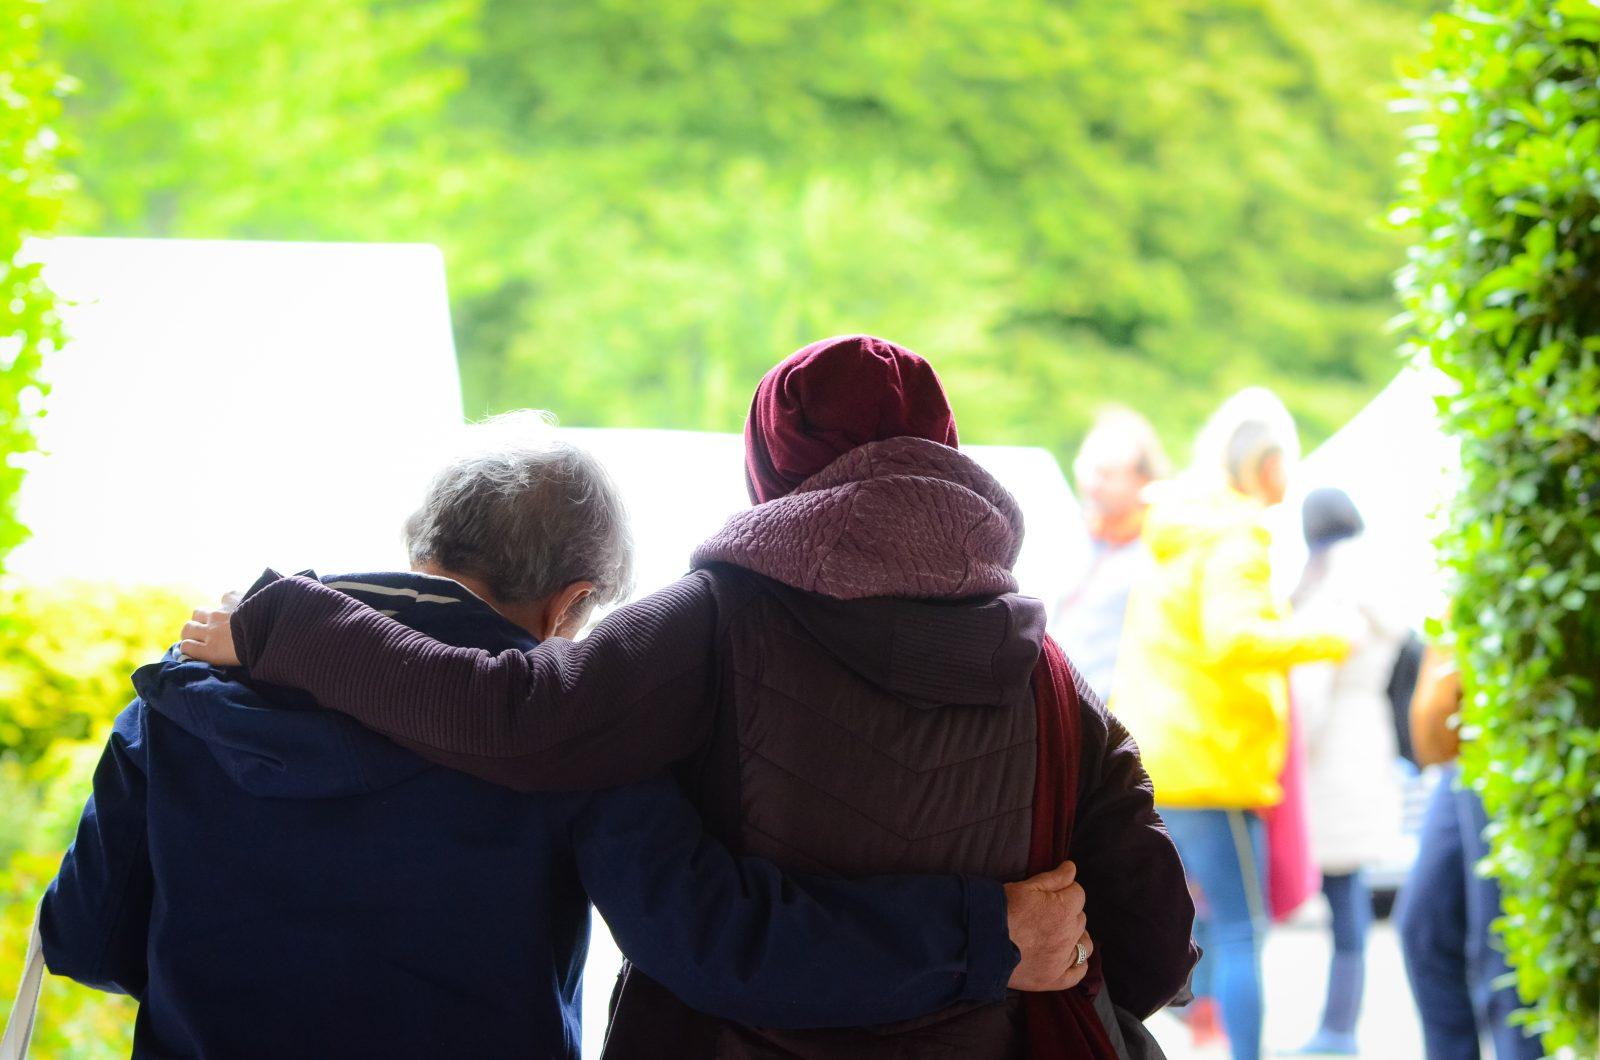 Peoples backs hugging Manjushri